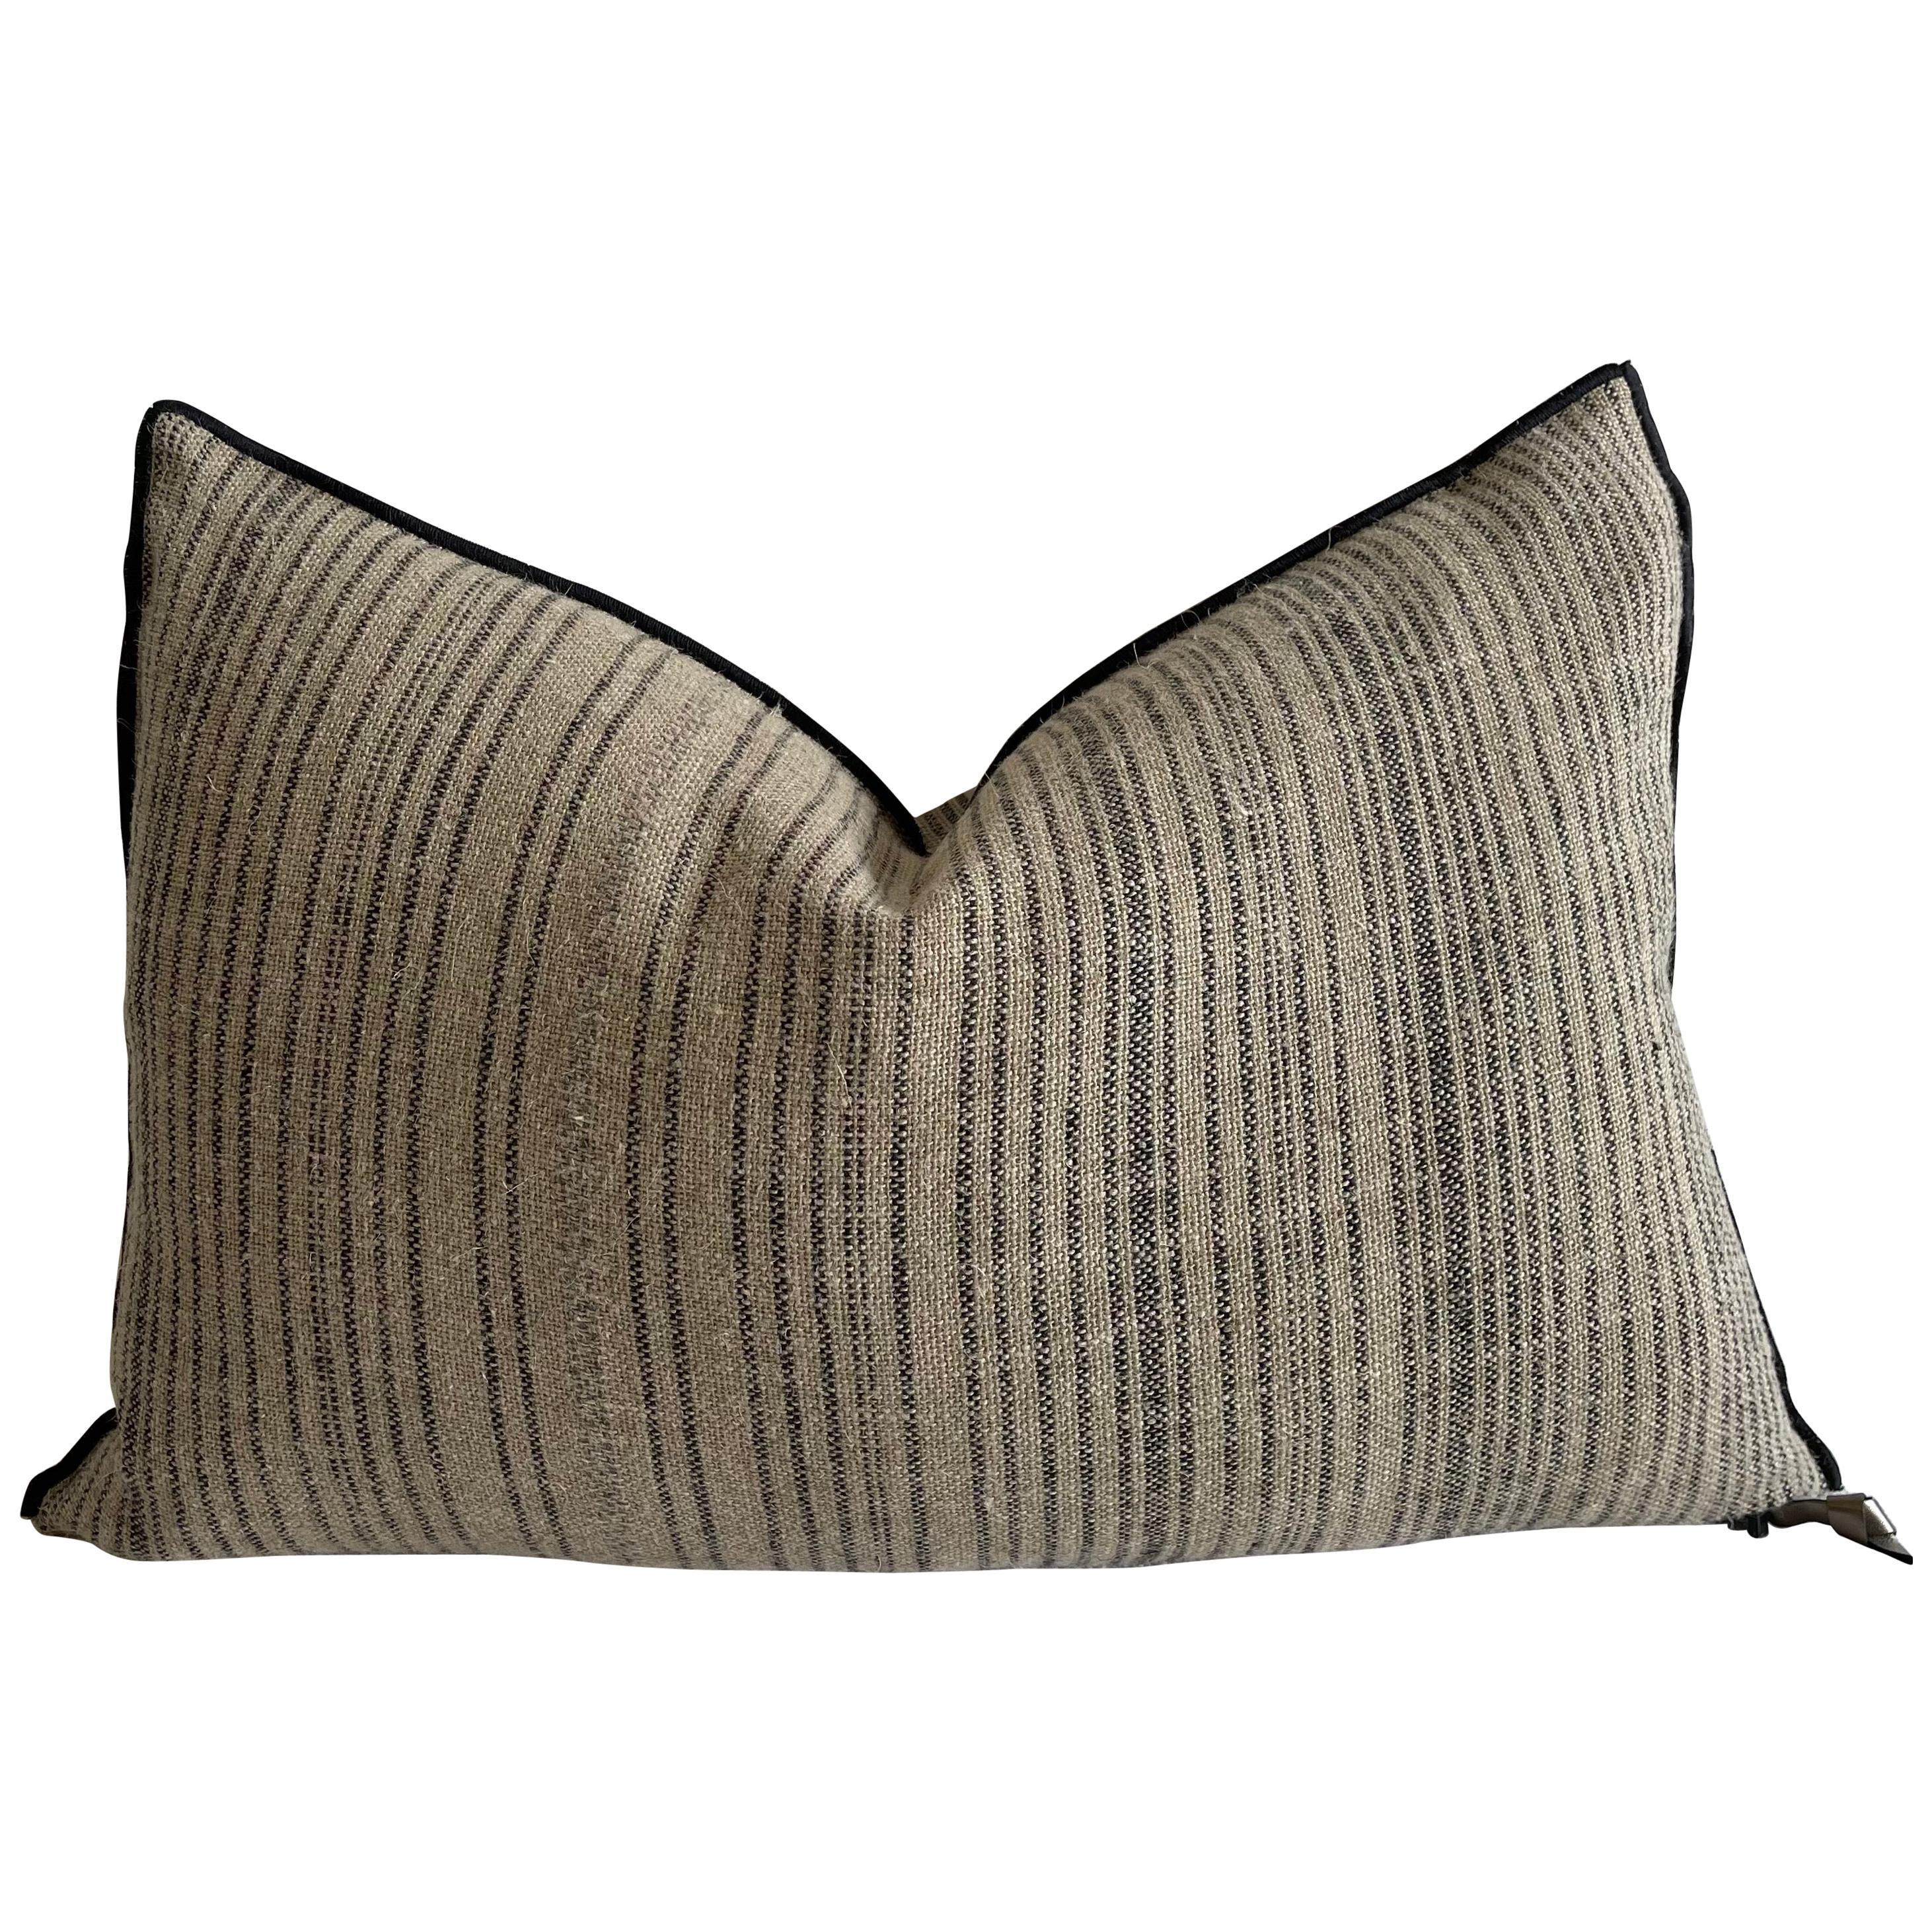 Custom Flax Linen with Black Ticking Stripe Lumbar Pillow